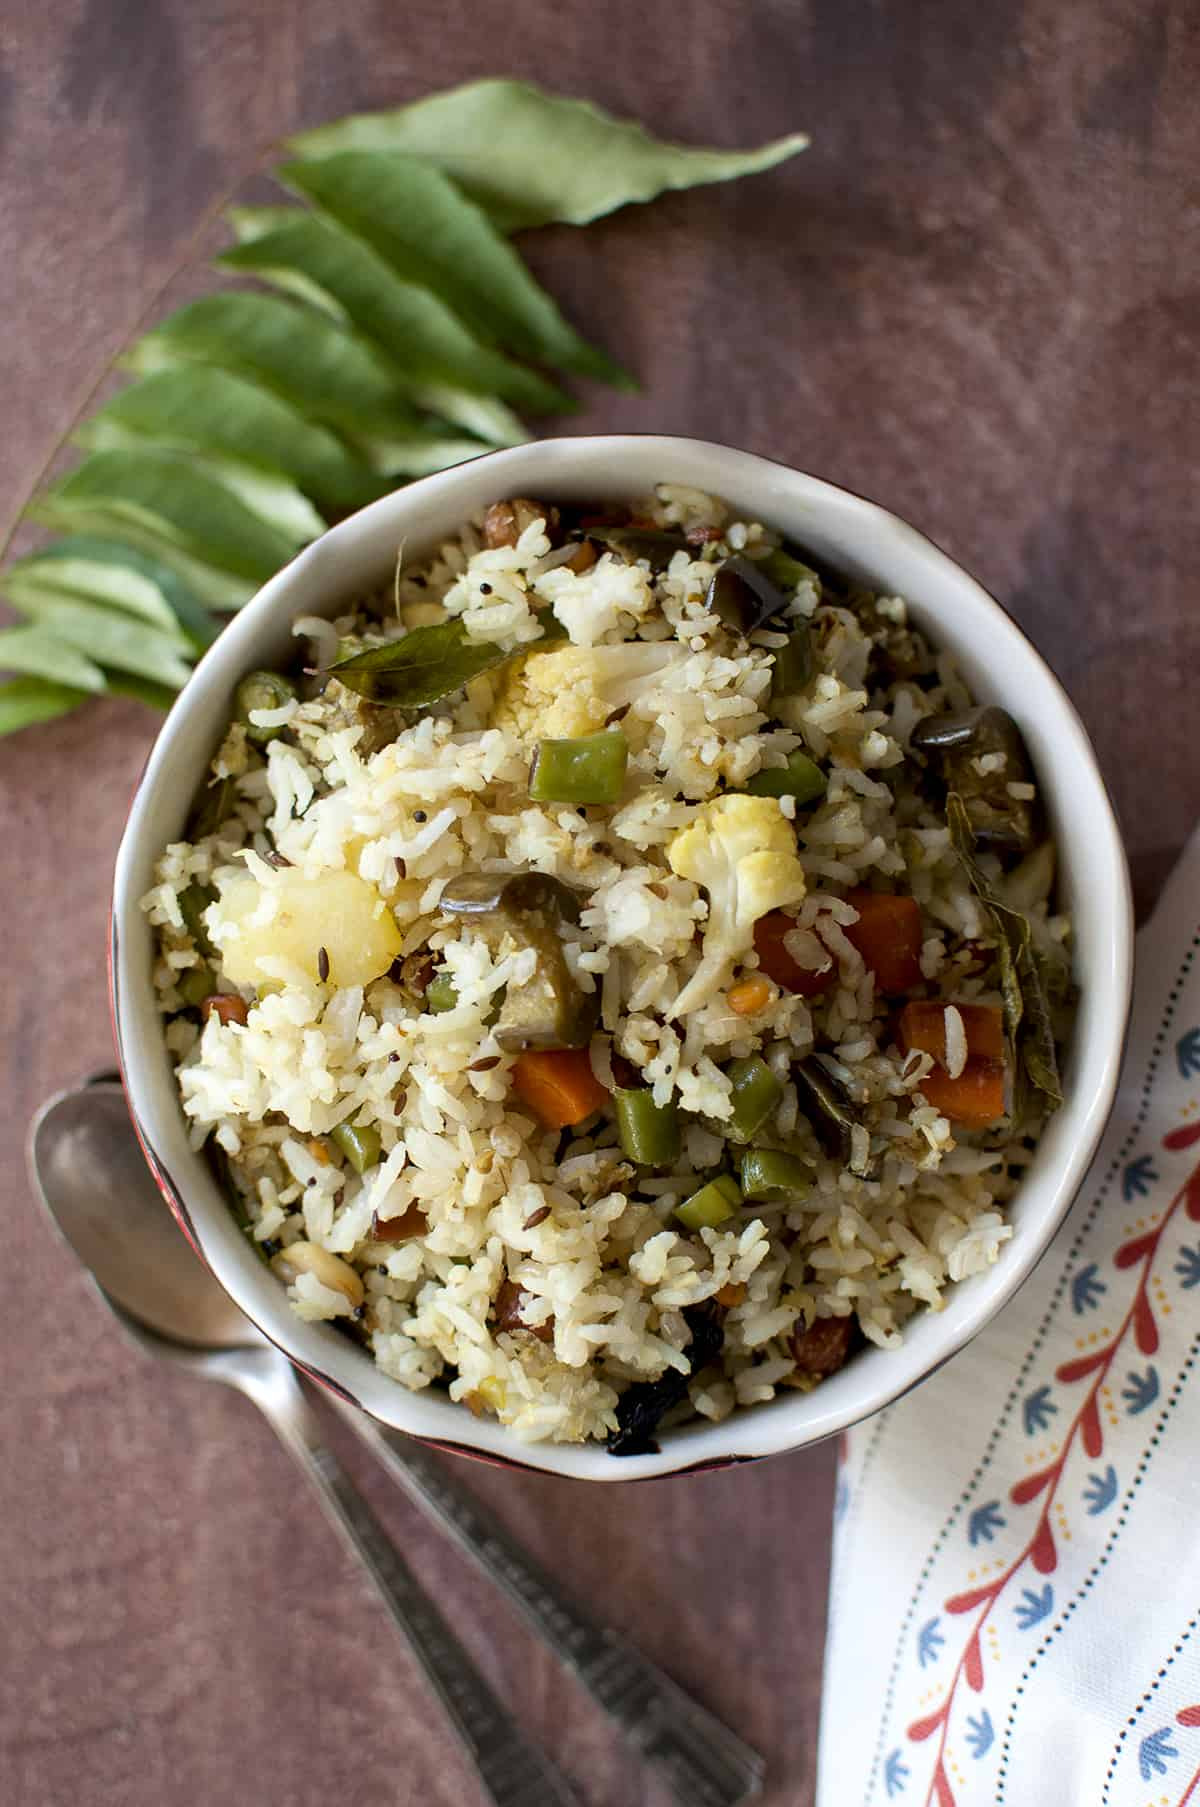 Dasara recipe - mixed vegetable rice served in white bowl